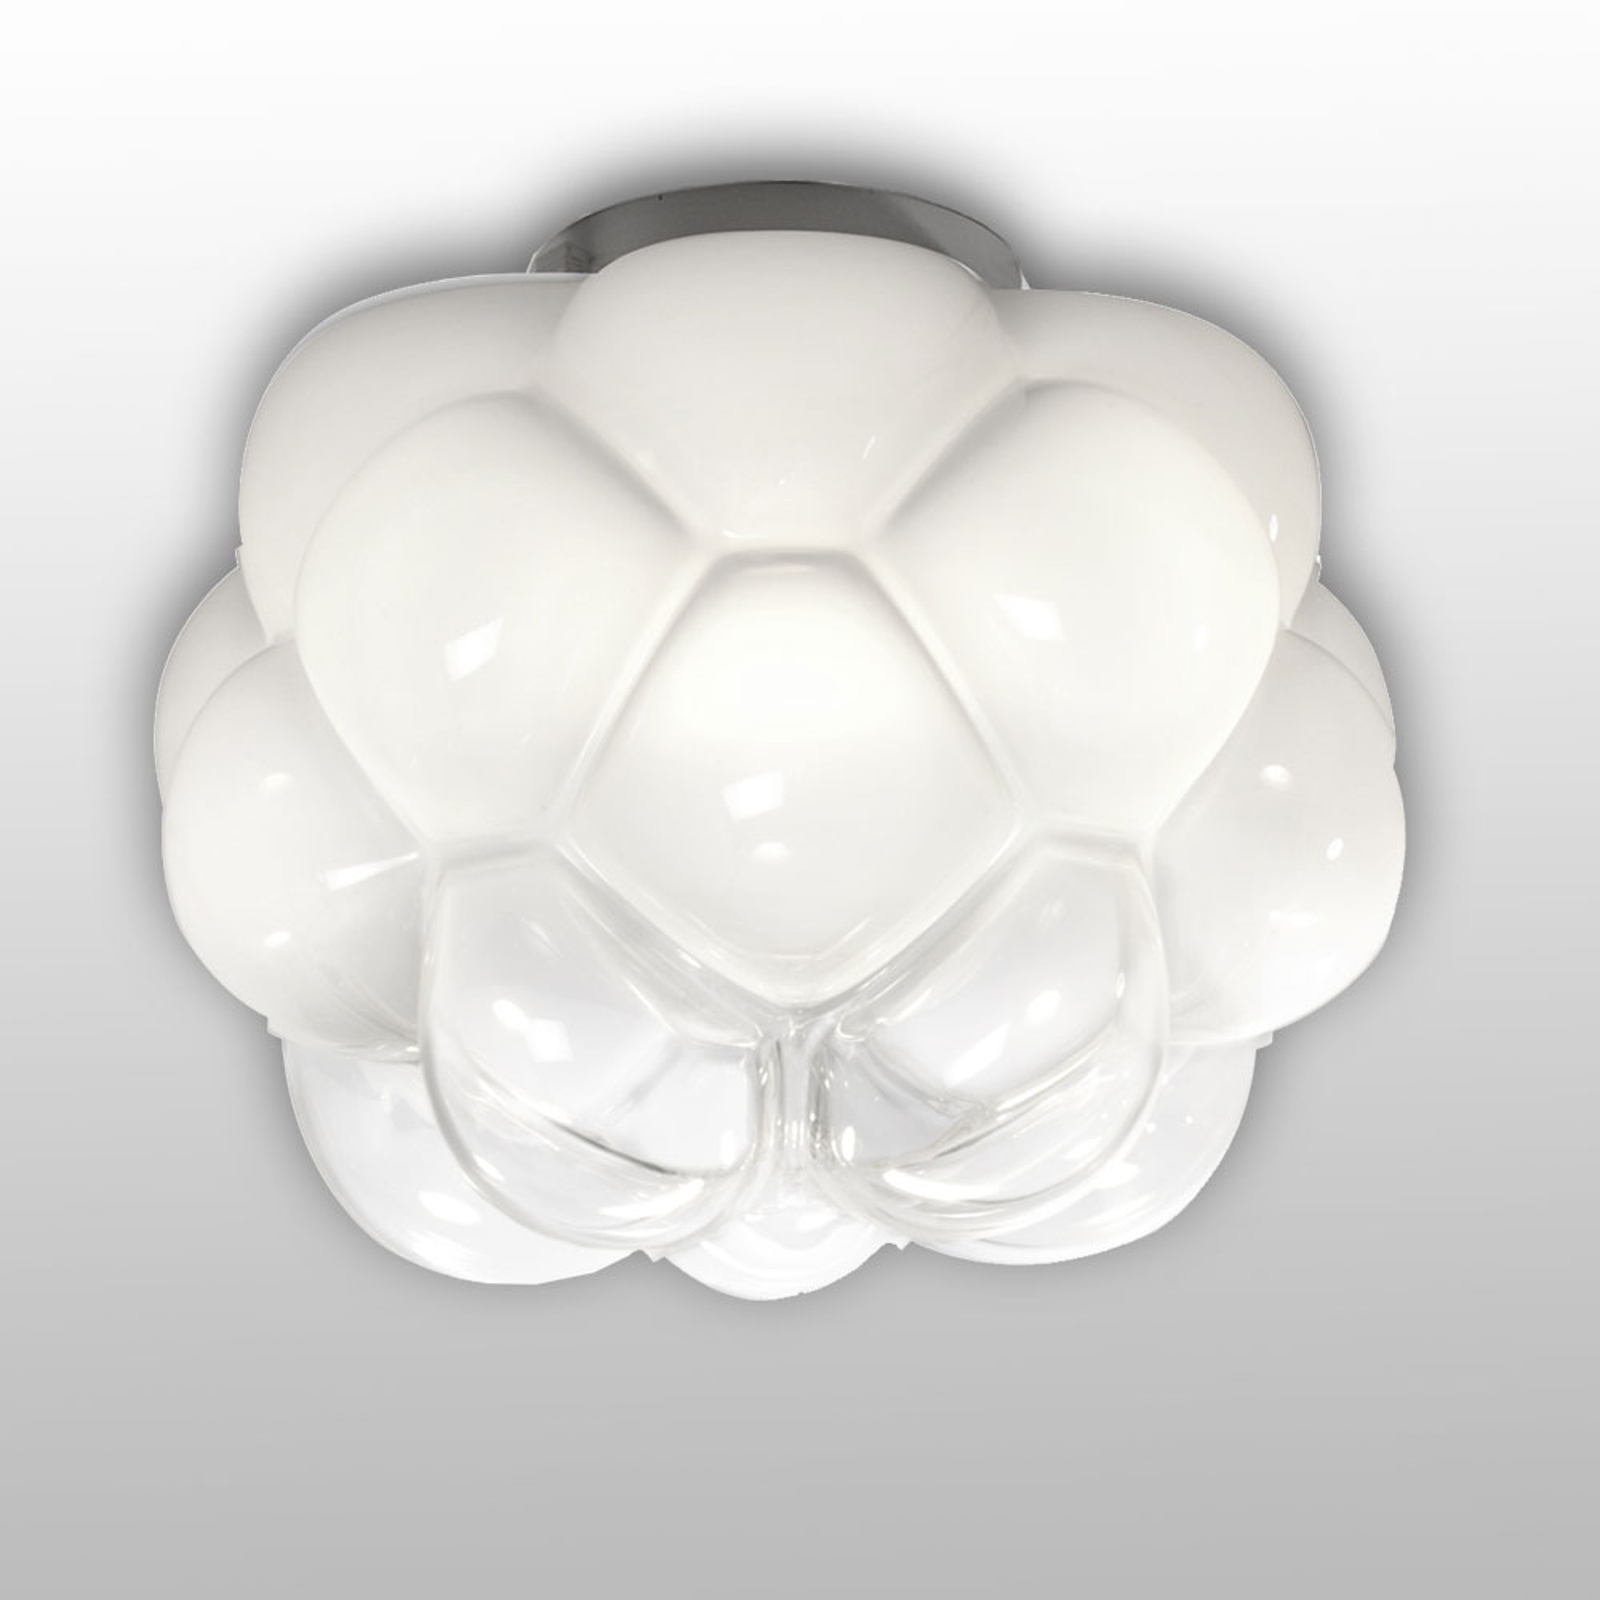 Lampa sufitowa LED CLOUDY w kszt. chmurki 26 cm